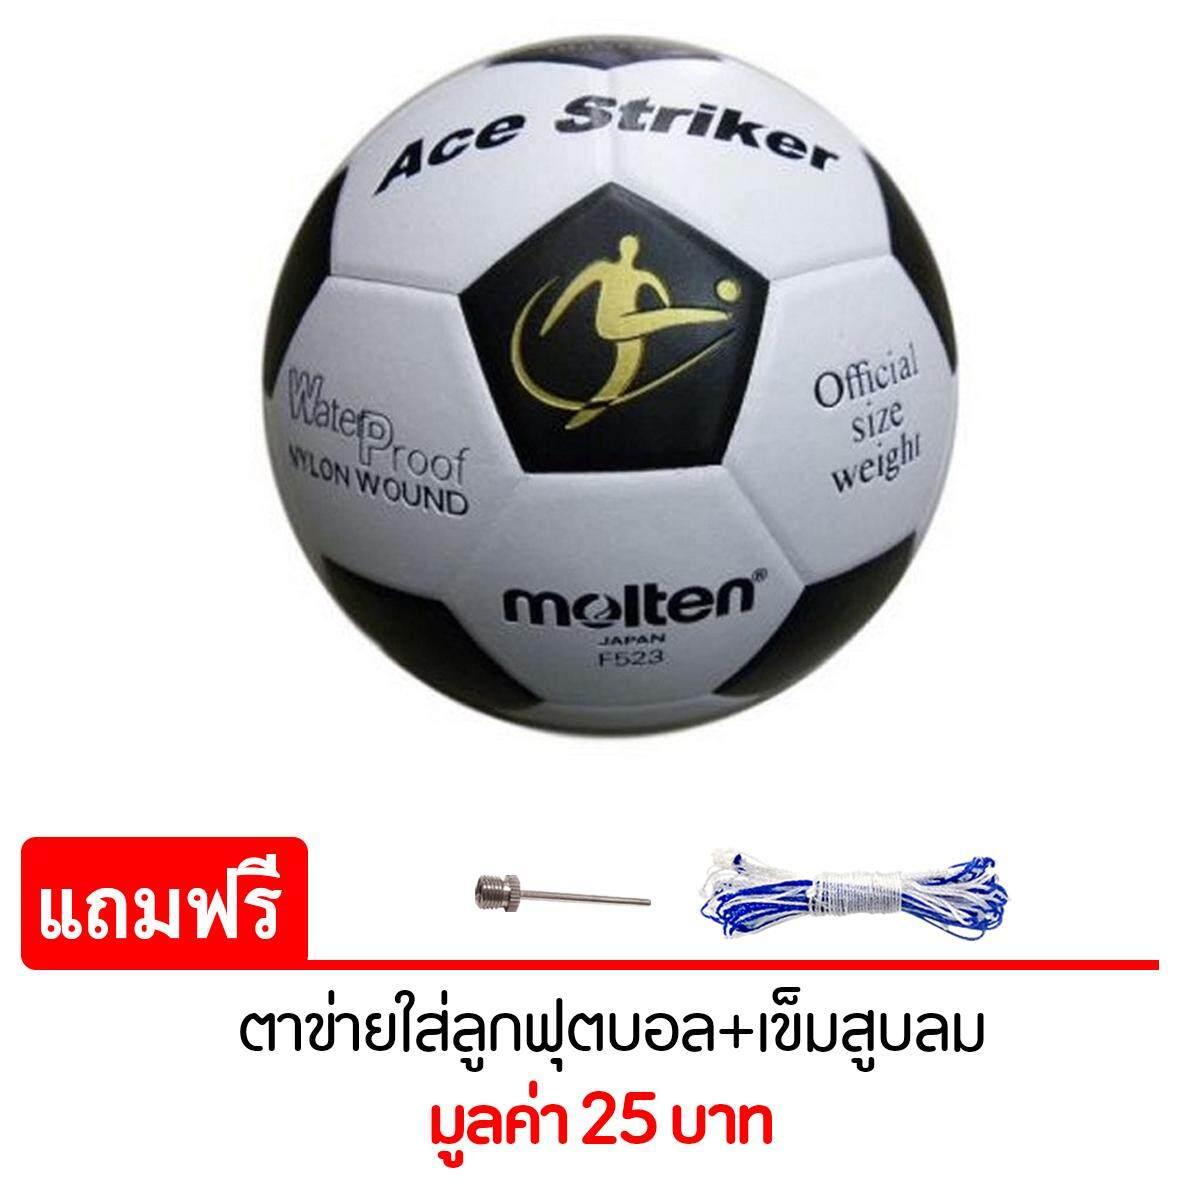 Molten ฟุตบอลFootball MOT PVC F523 ACE Striker - White//Black  แถมฟรี ตาข่ายใส่ลูกฟุตบอล + เข็มสูบลม